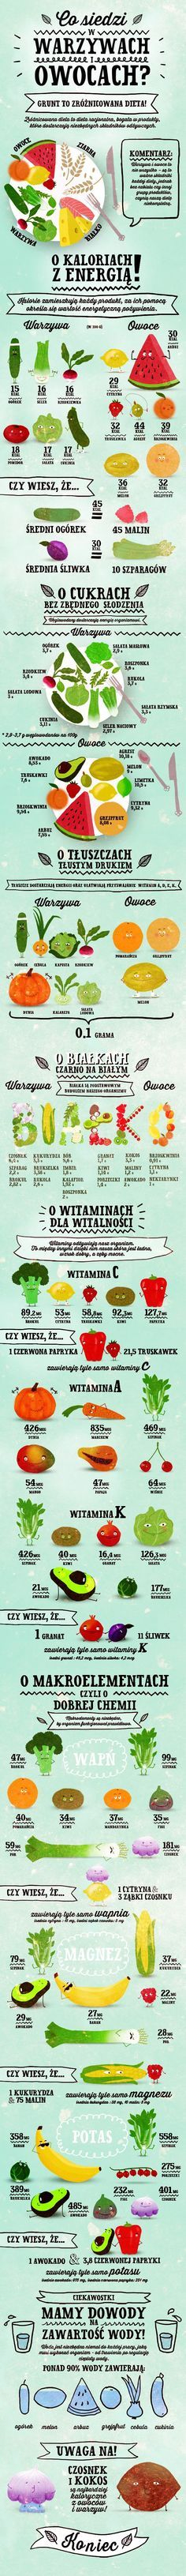 Co siedzi w owocach i warzywach Healthy Tips, Healthy Eating, Healthy Recipes, Health Diet, Health Fitness, Food Facts, Healthier You, Clean Recipes, Superfood